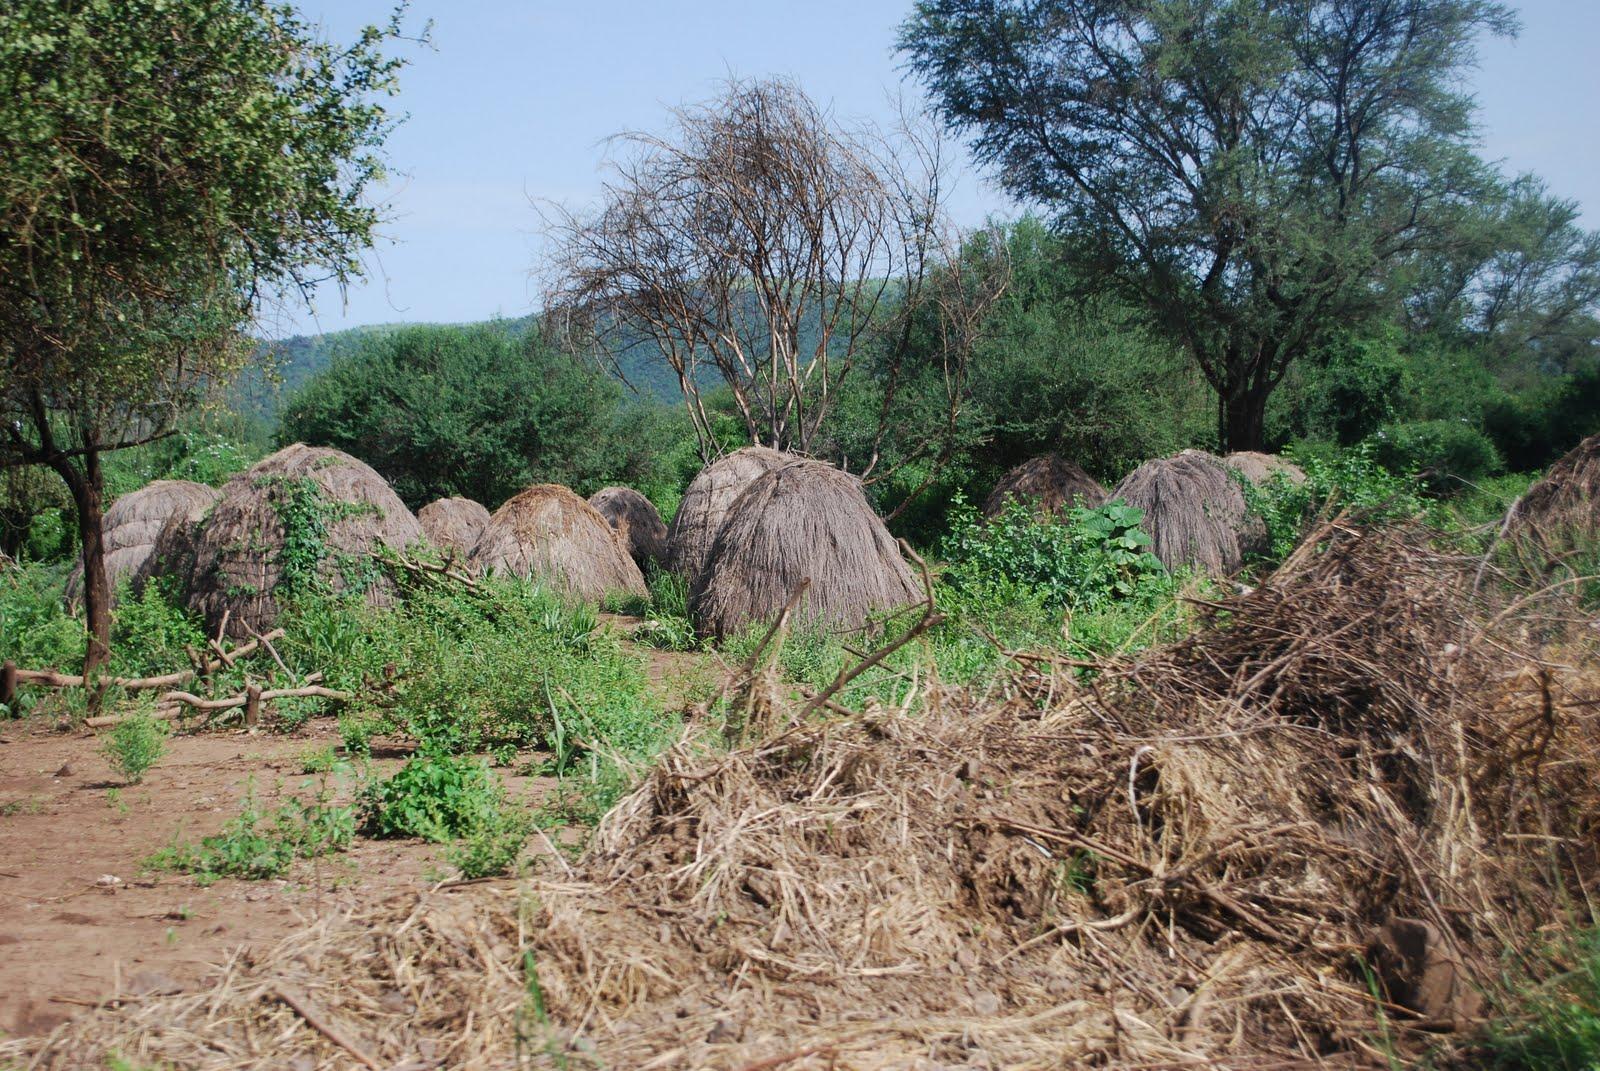 Mursi warriors - Mago National Park, Omo Valley, Ethiopia